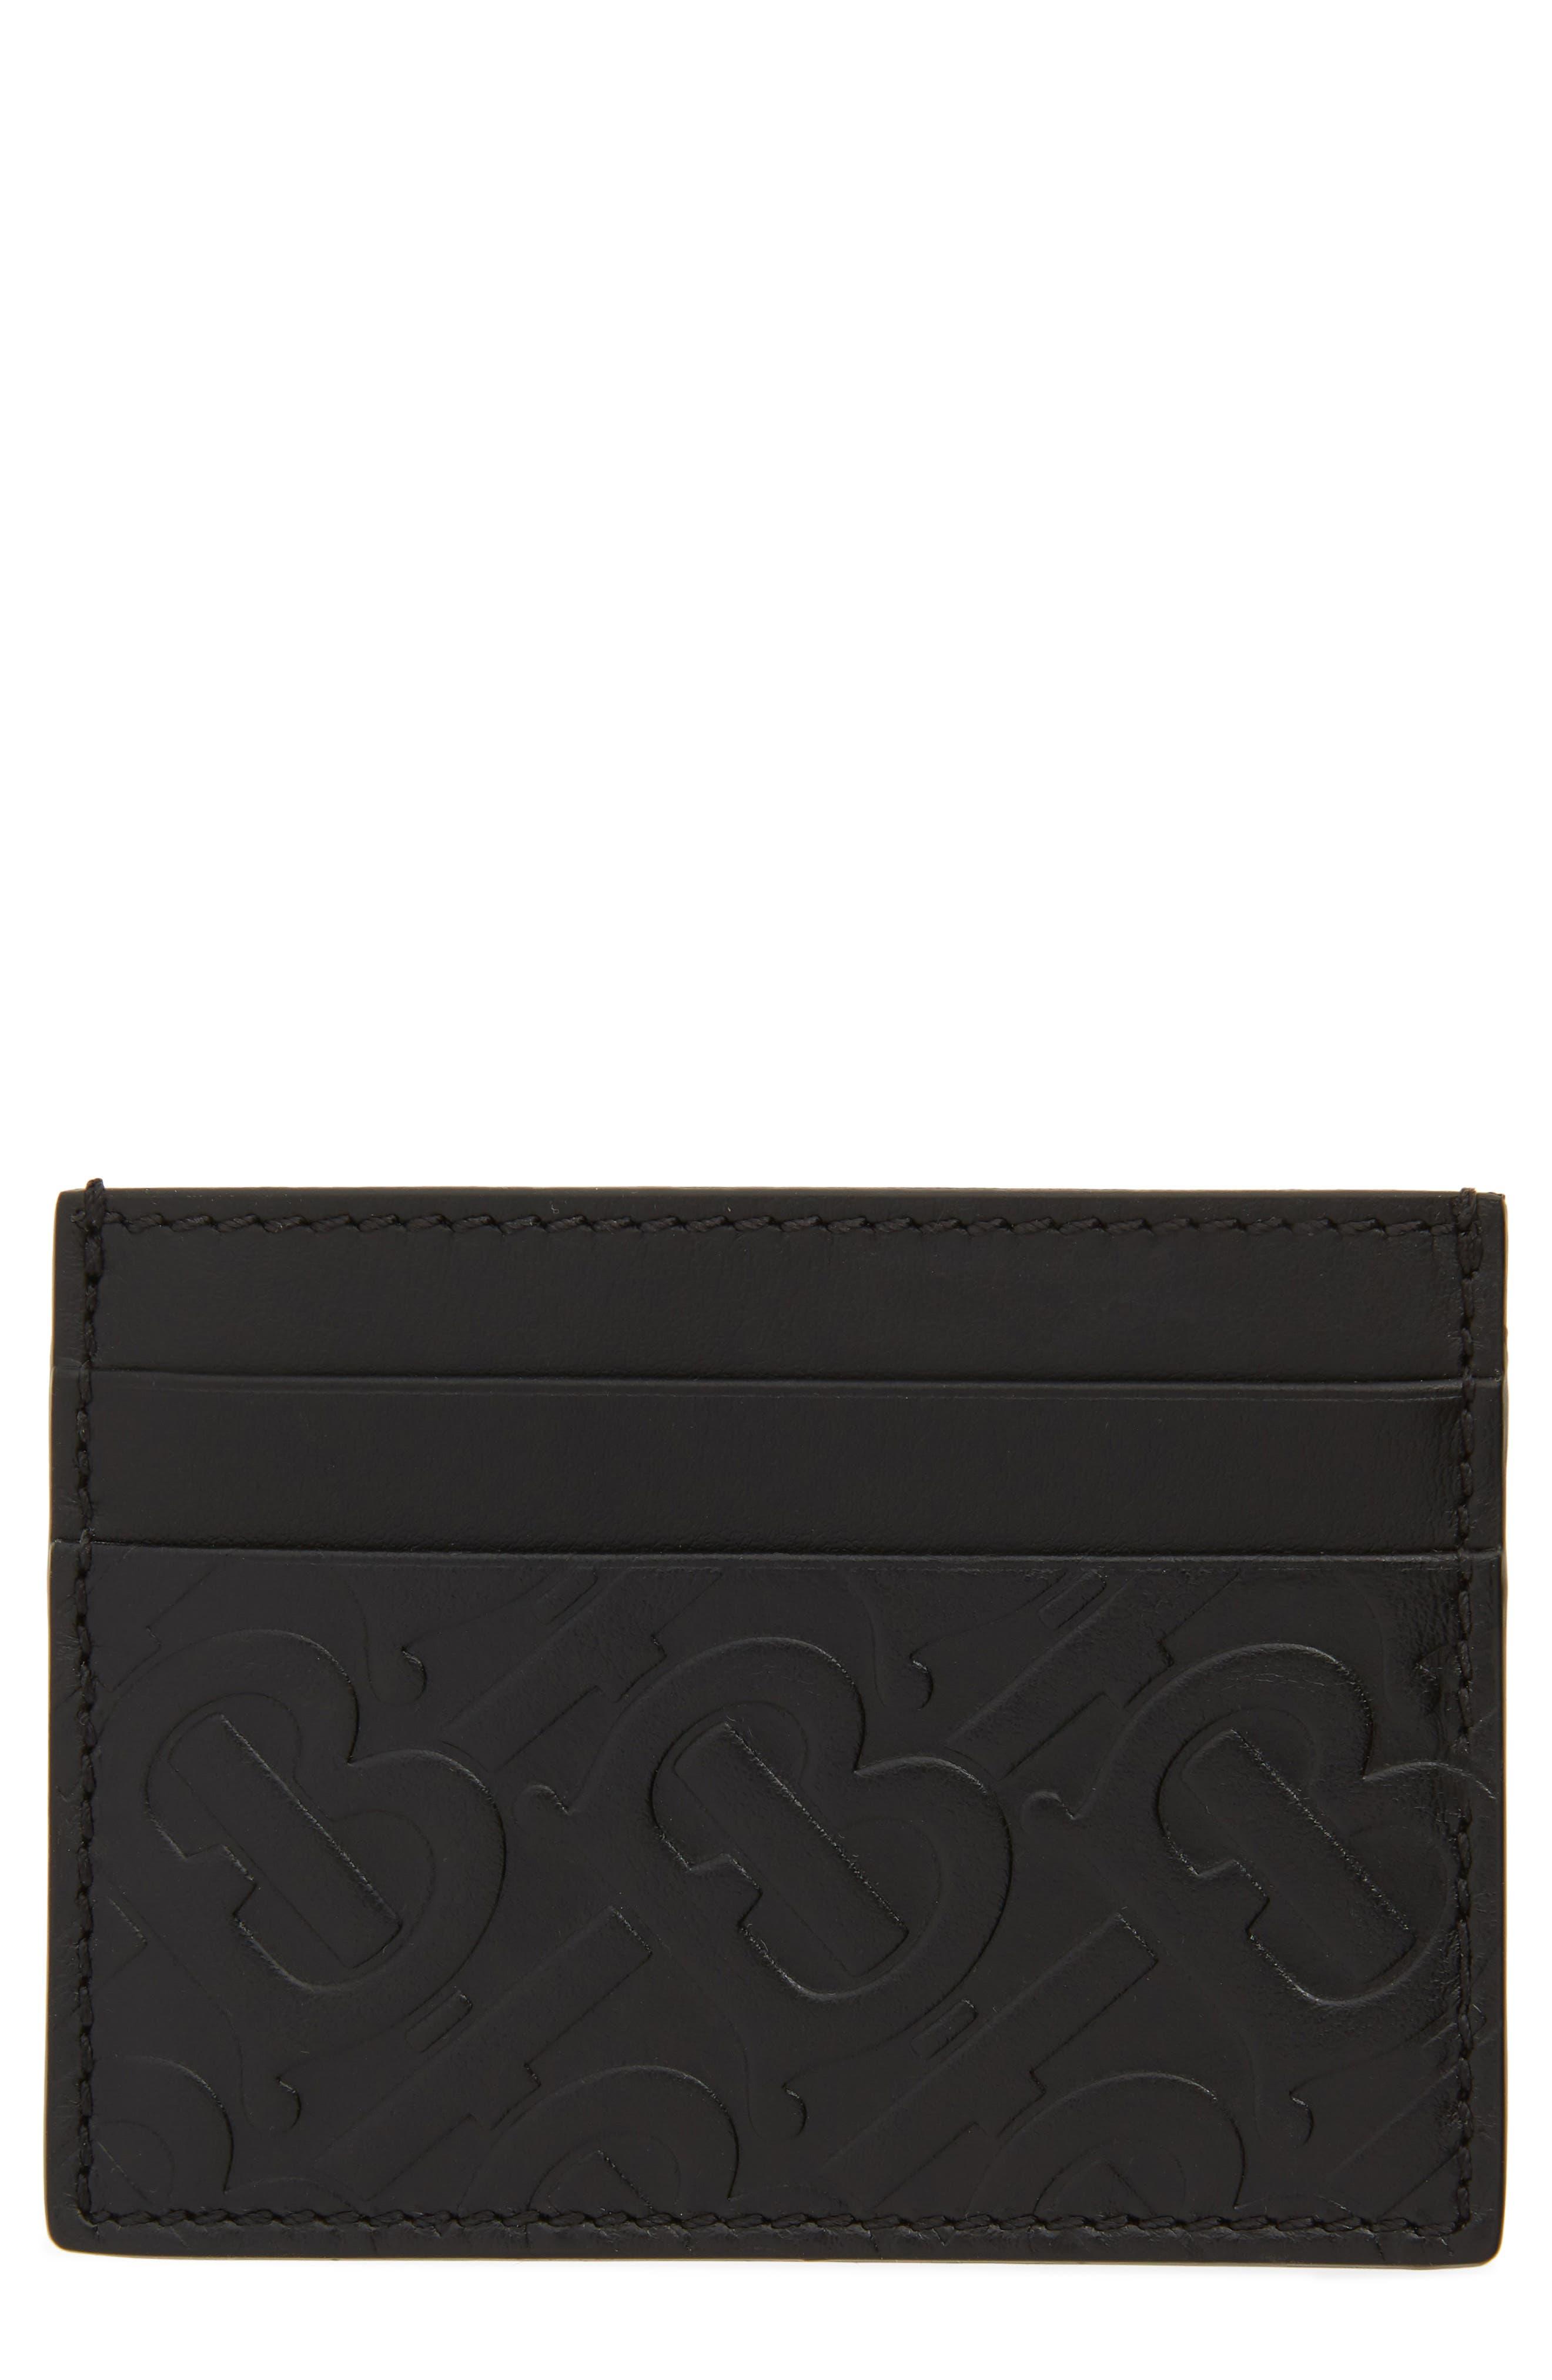 BURBERRY Sandon Monogram Leather Card Case, Main, color, BLACK